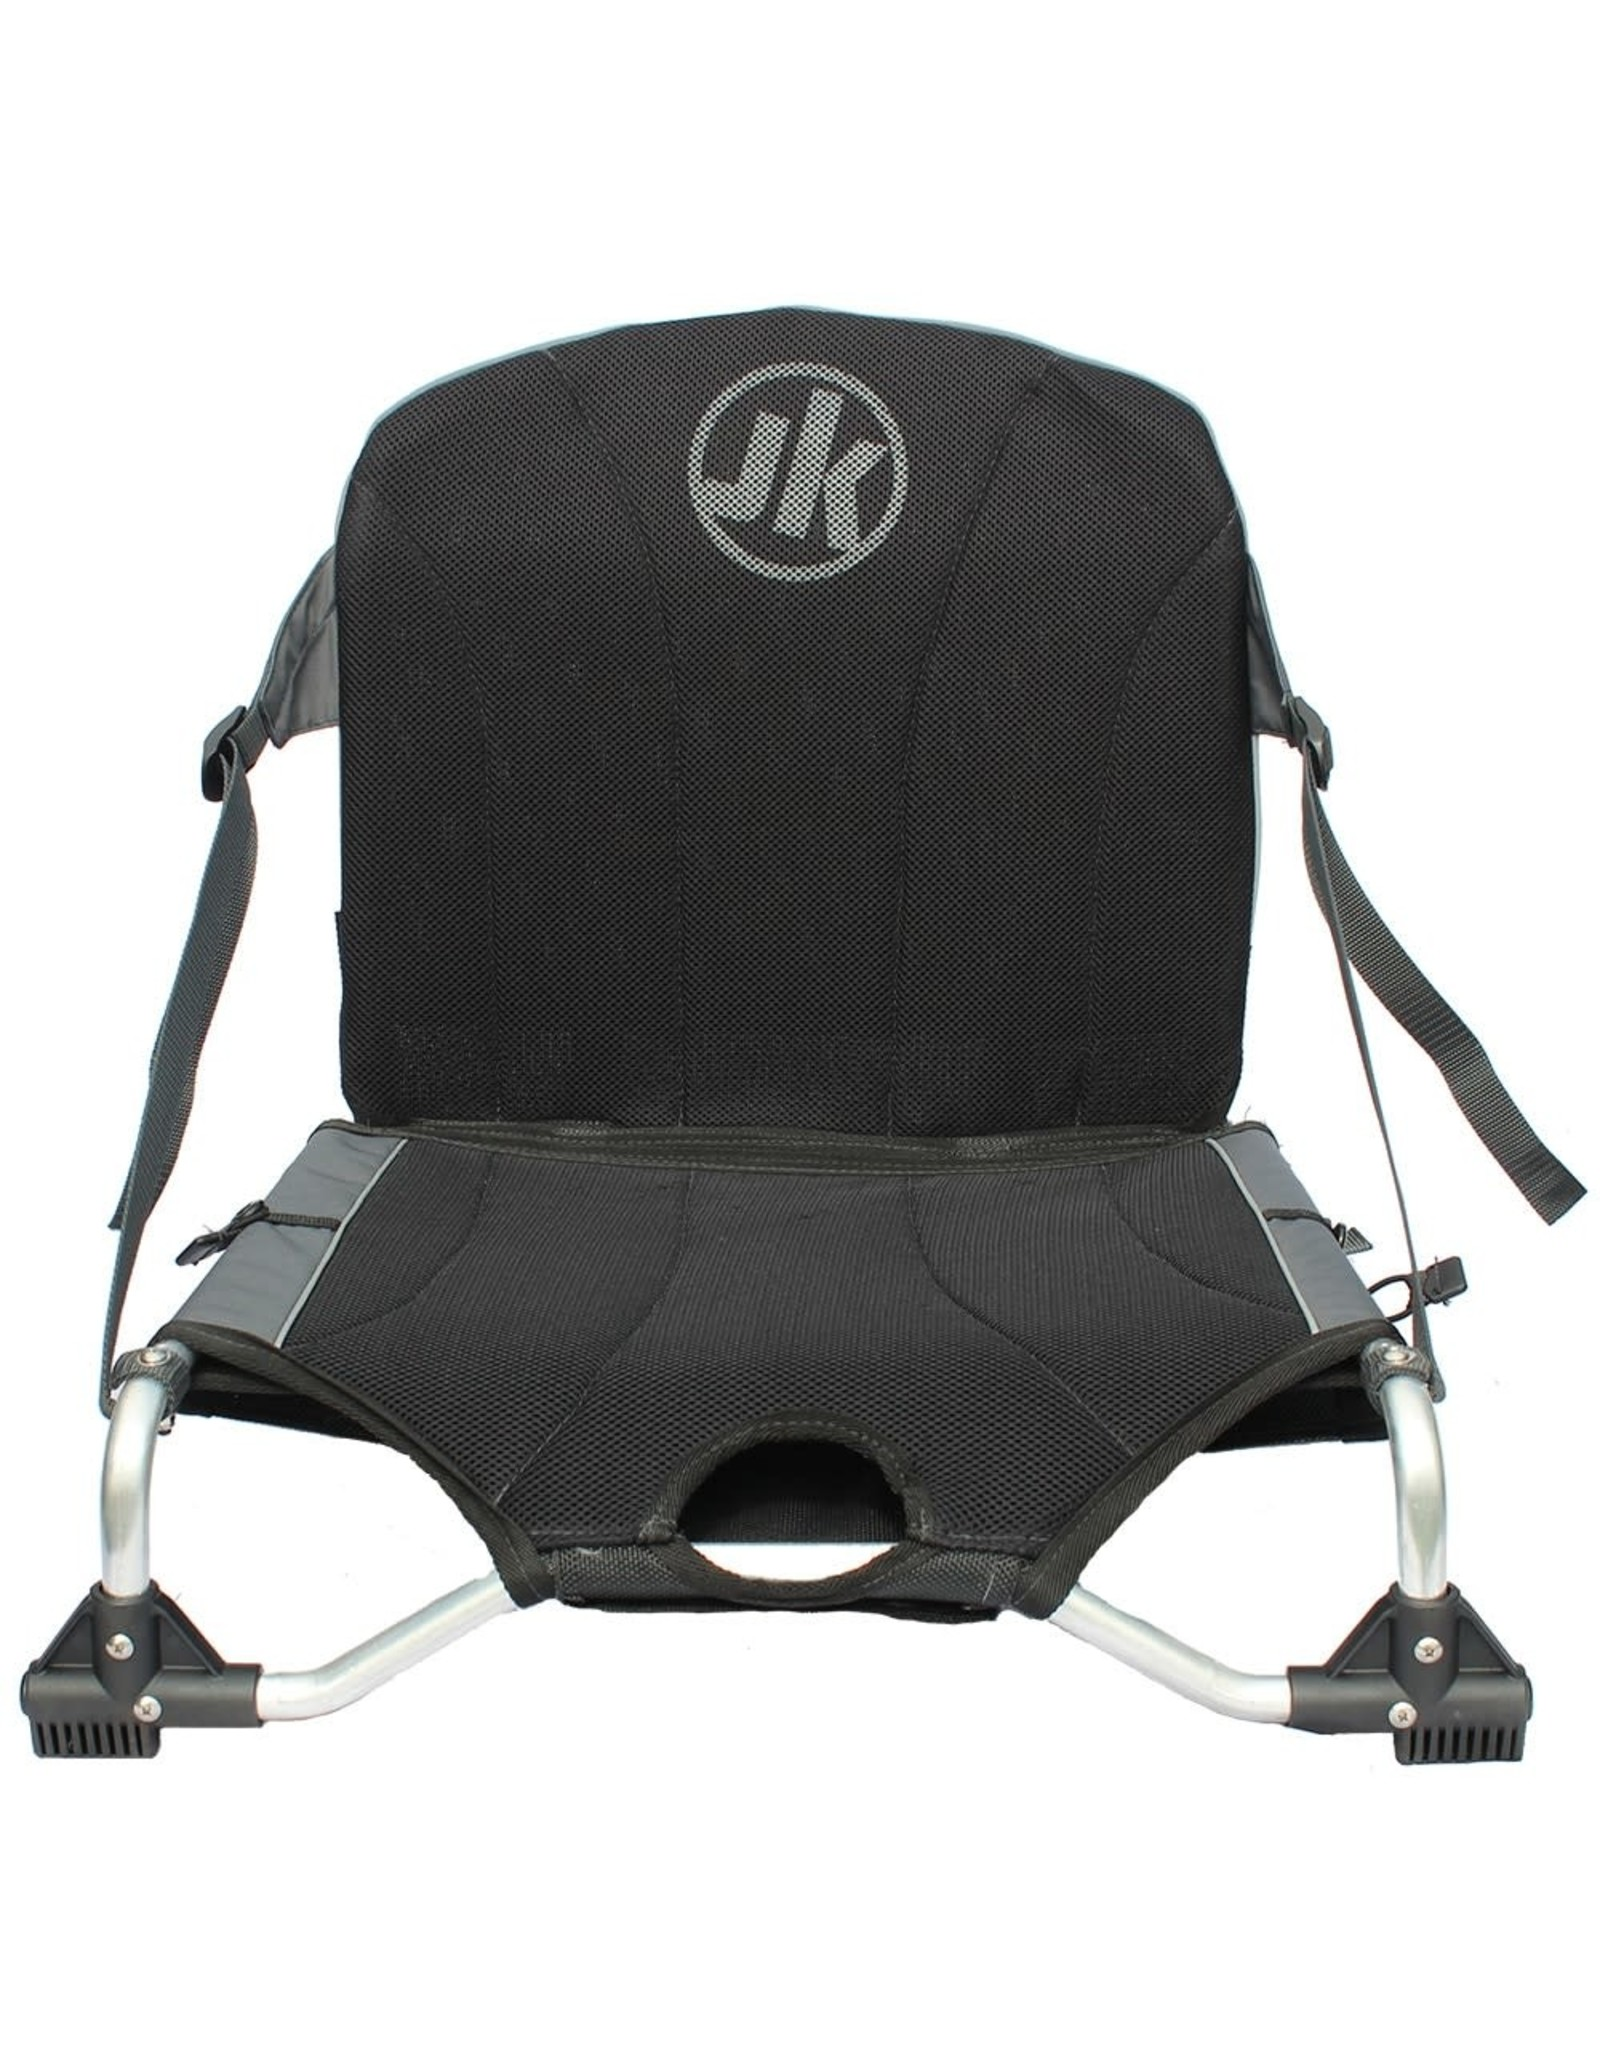 Jackson Kayaks Jackson Elite Seat Kit 3.0 (Big Rig, FD, HD ou Coosa FD)